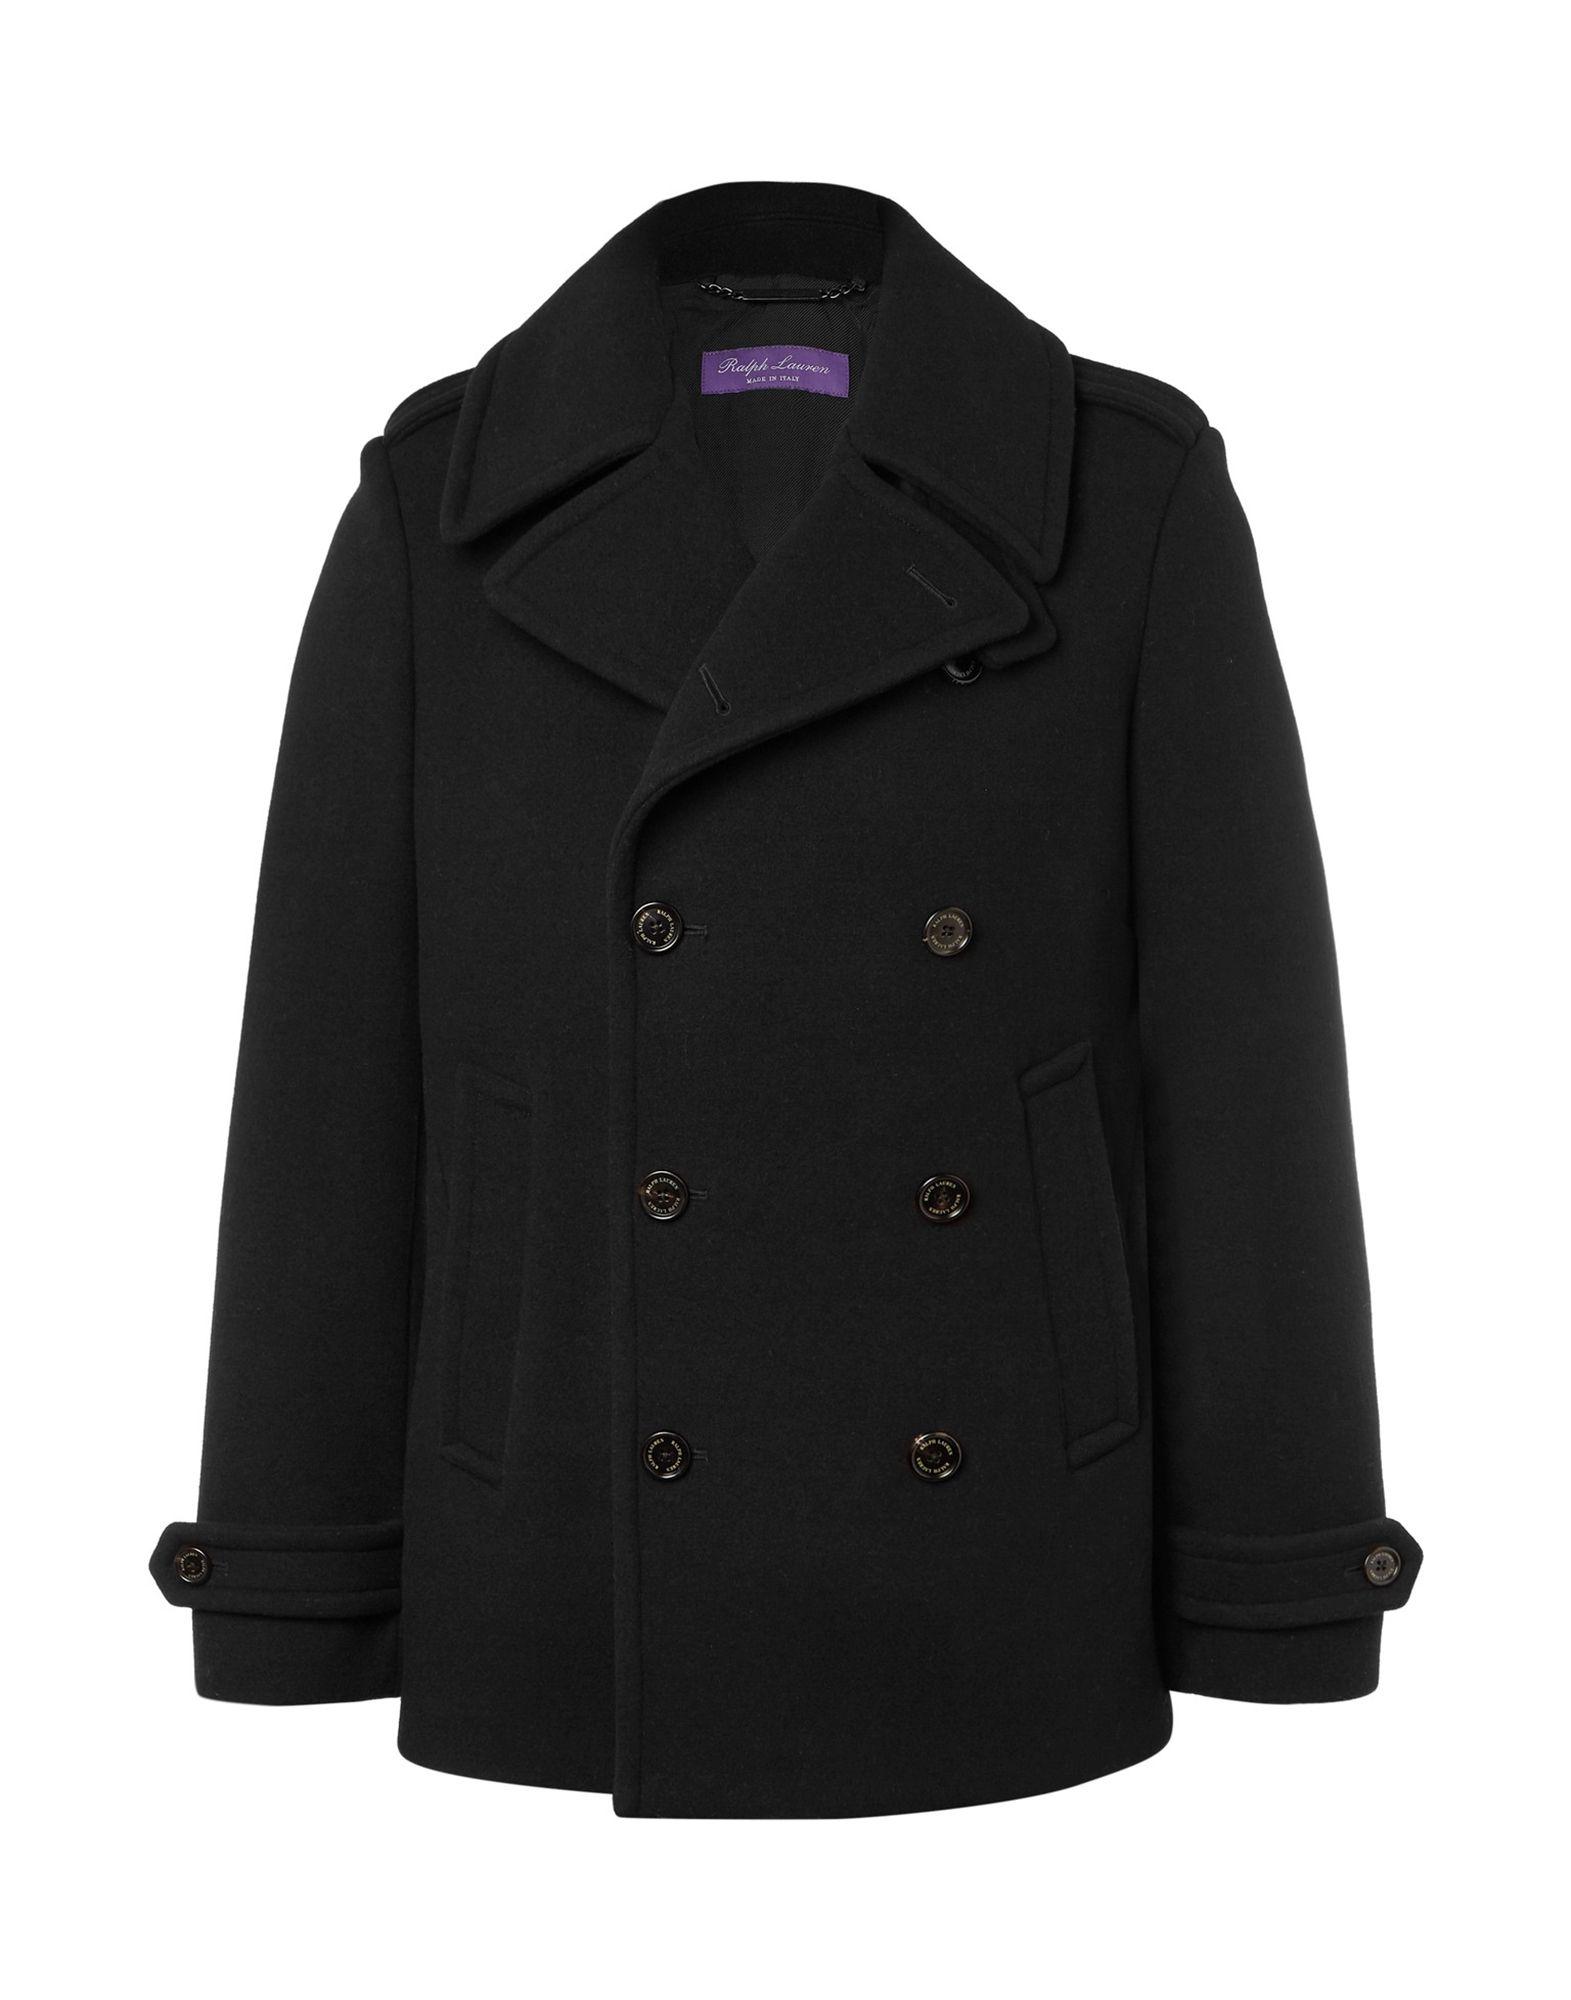 RALPH LAUREN PURPLE LABEL Пальто ralph lauren purple label пальто